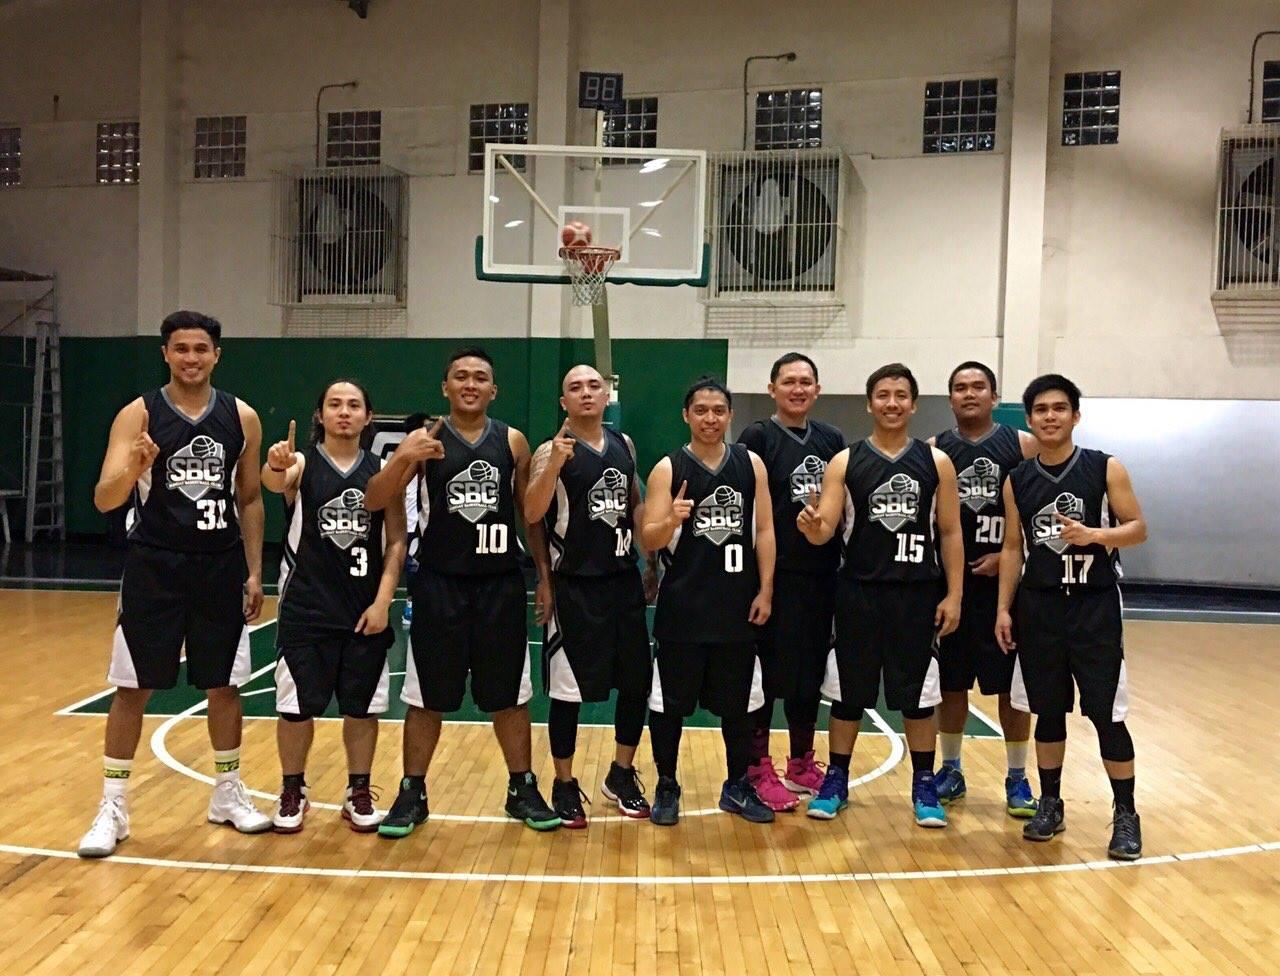 Sunday Basketball Club LGR